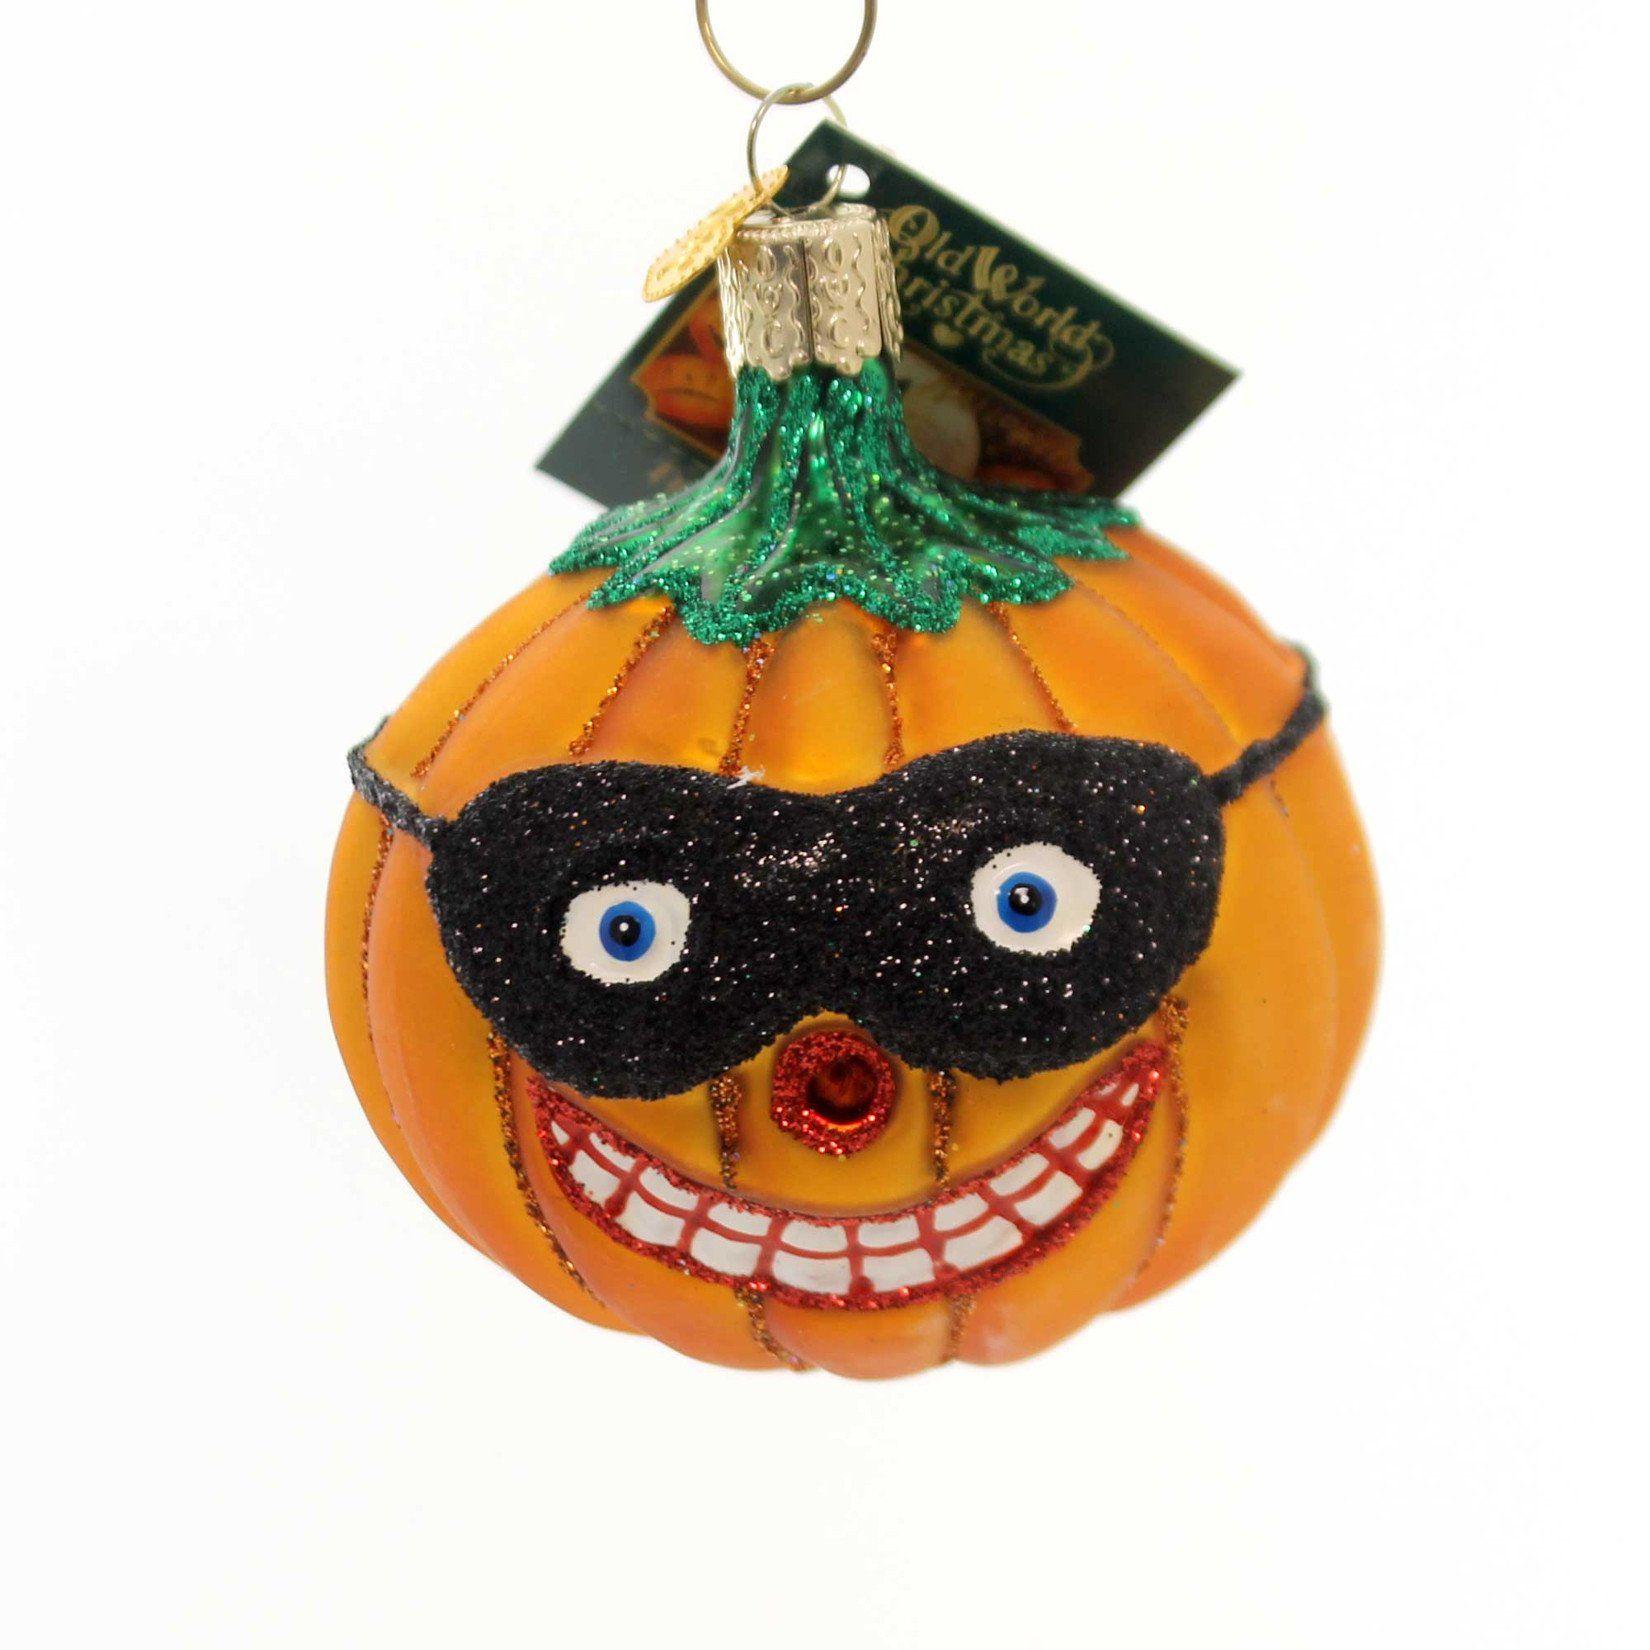 Old World Christmas MASKED JACK O'LANTERN Ornament Pumpkin